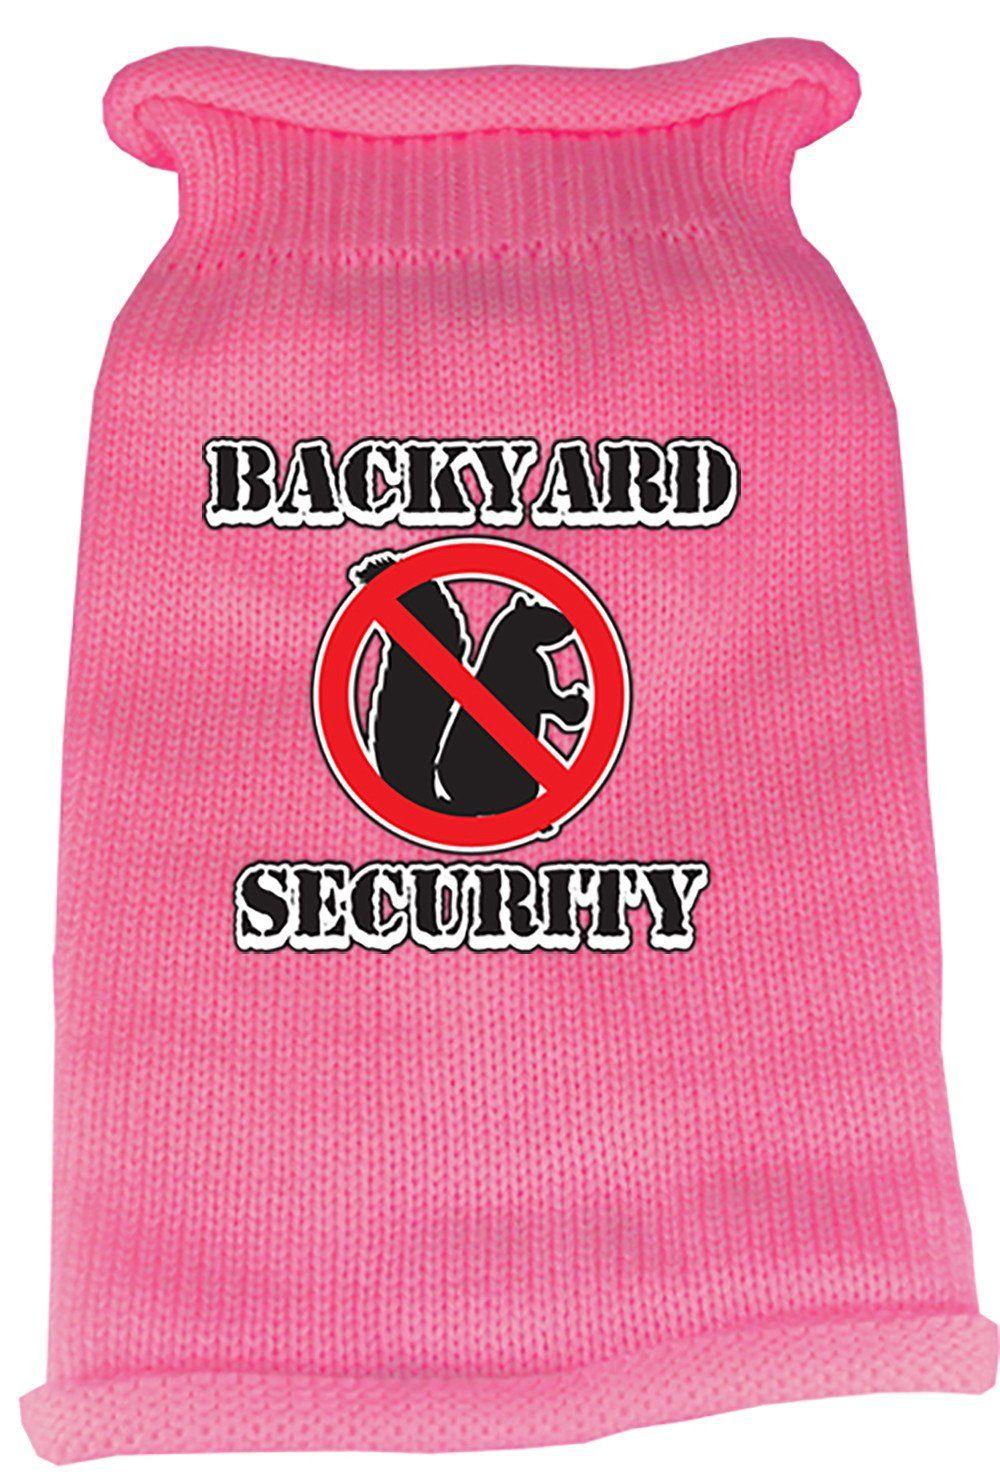 Back Yard Security Screen Print Knit Pet Sweater Pet